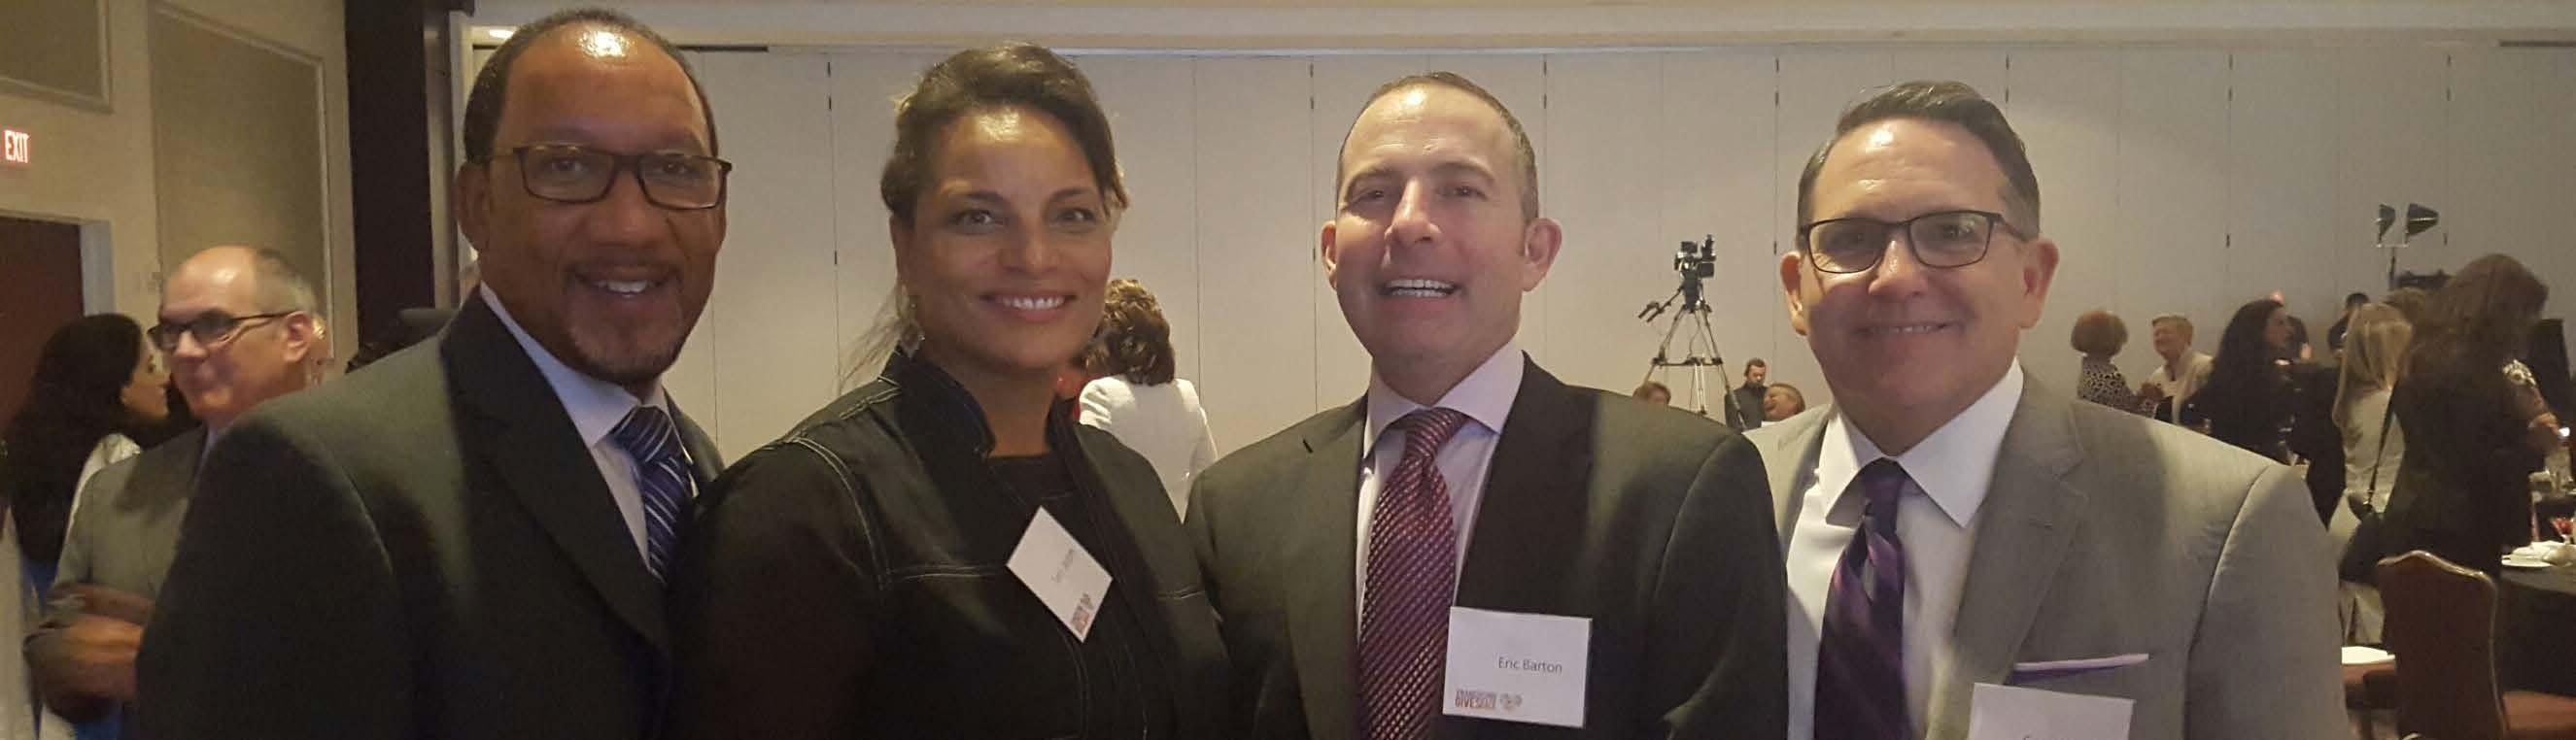 Arthritis Foundation and Massage Envy Partnership Honored at Inaugural Franchising Gives Back Awards